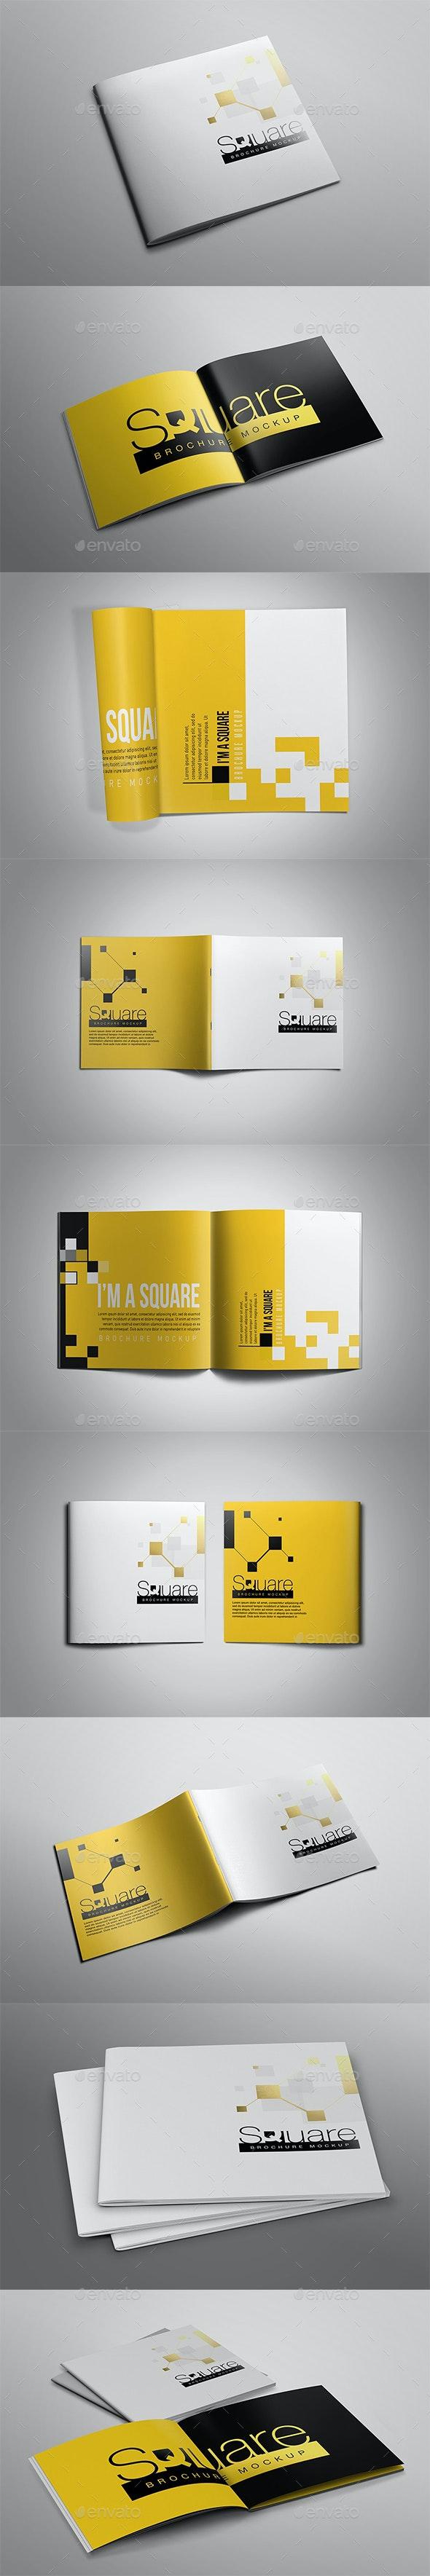 Square Brochure Mockup - Books Print